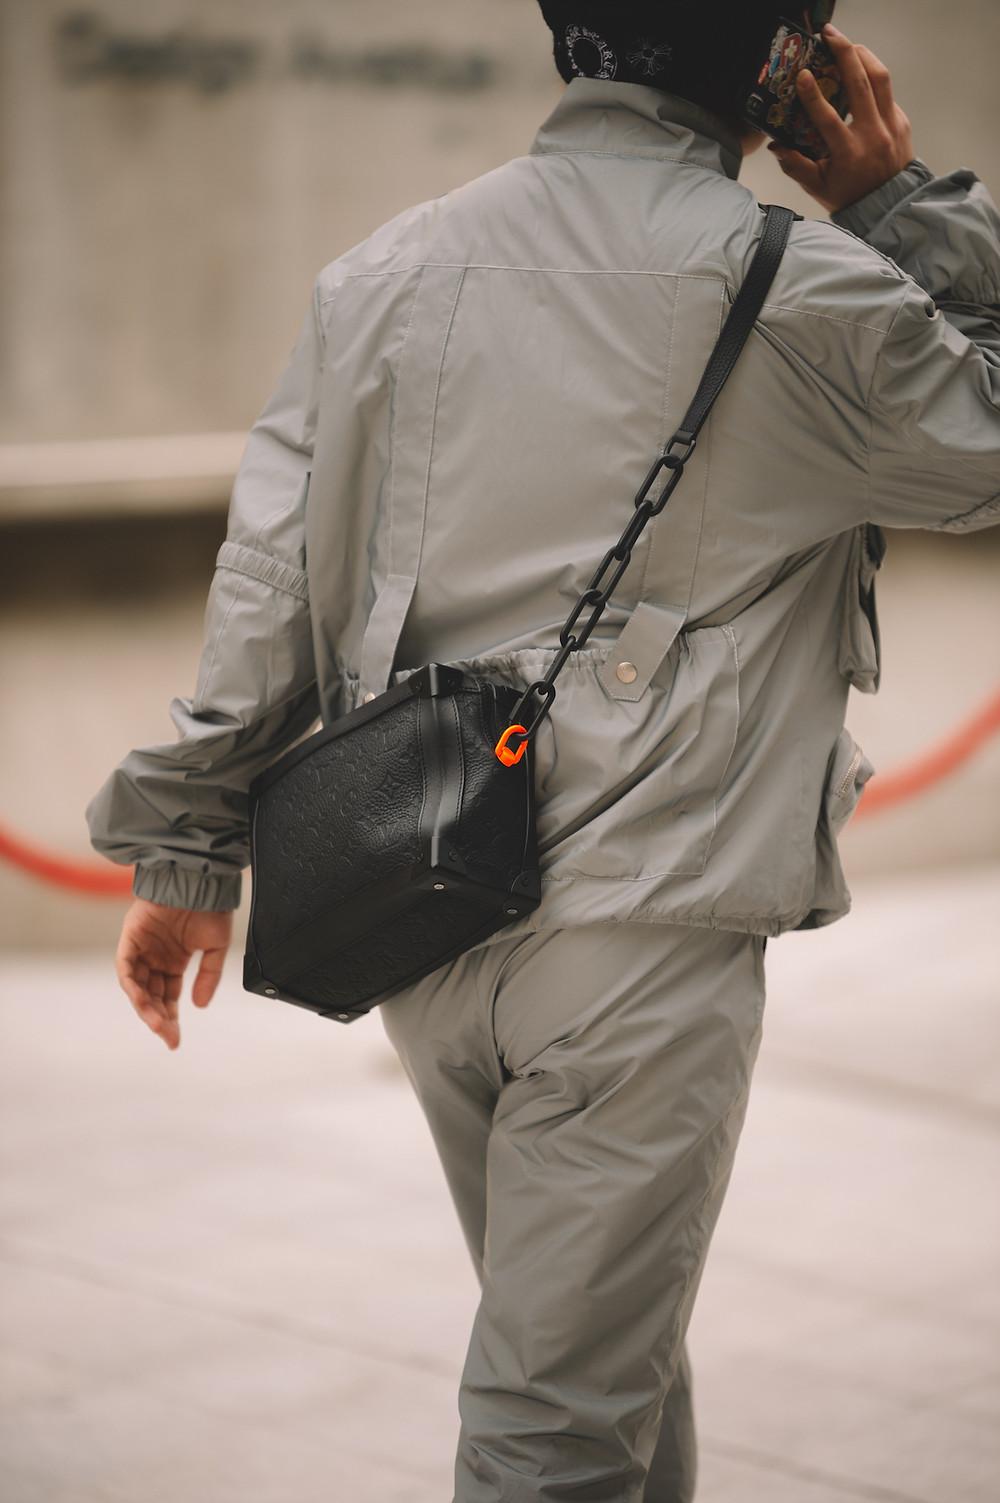 Louis Vuitton bag by Menswear Director Virgil Abloh